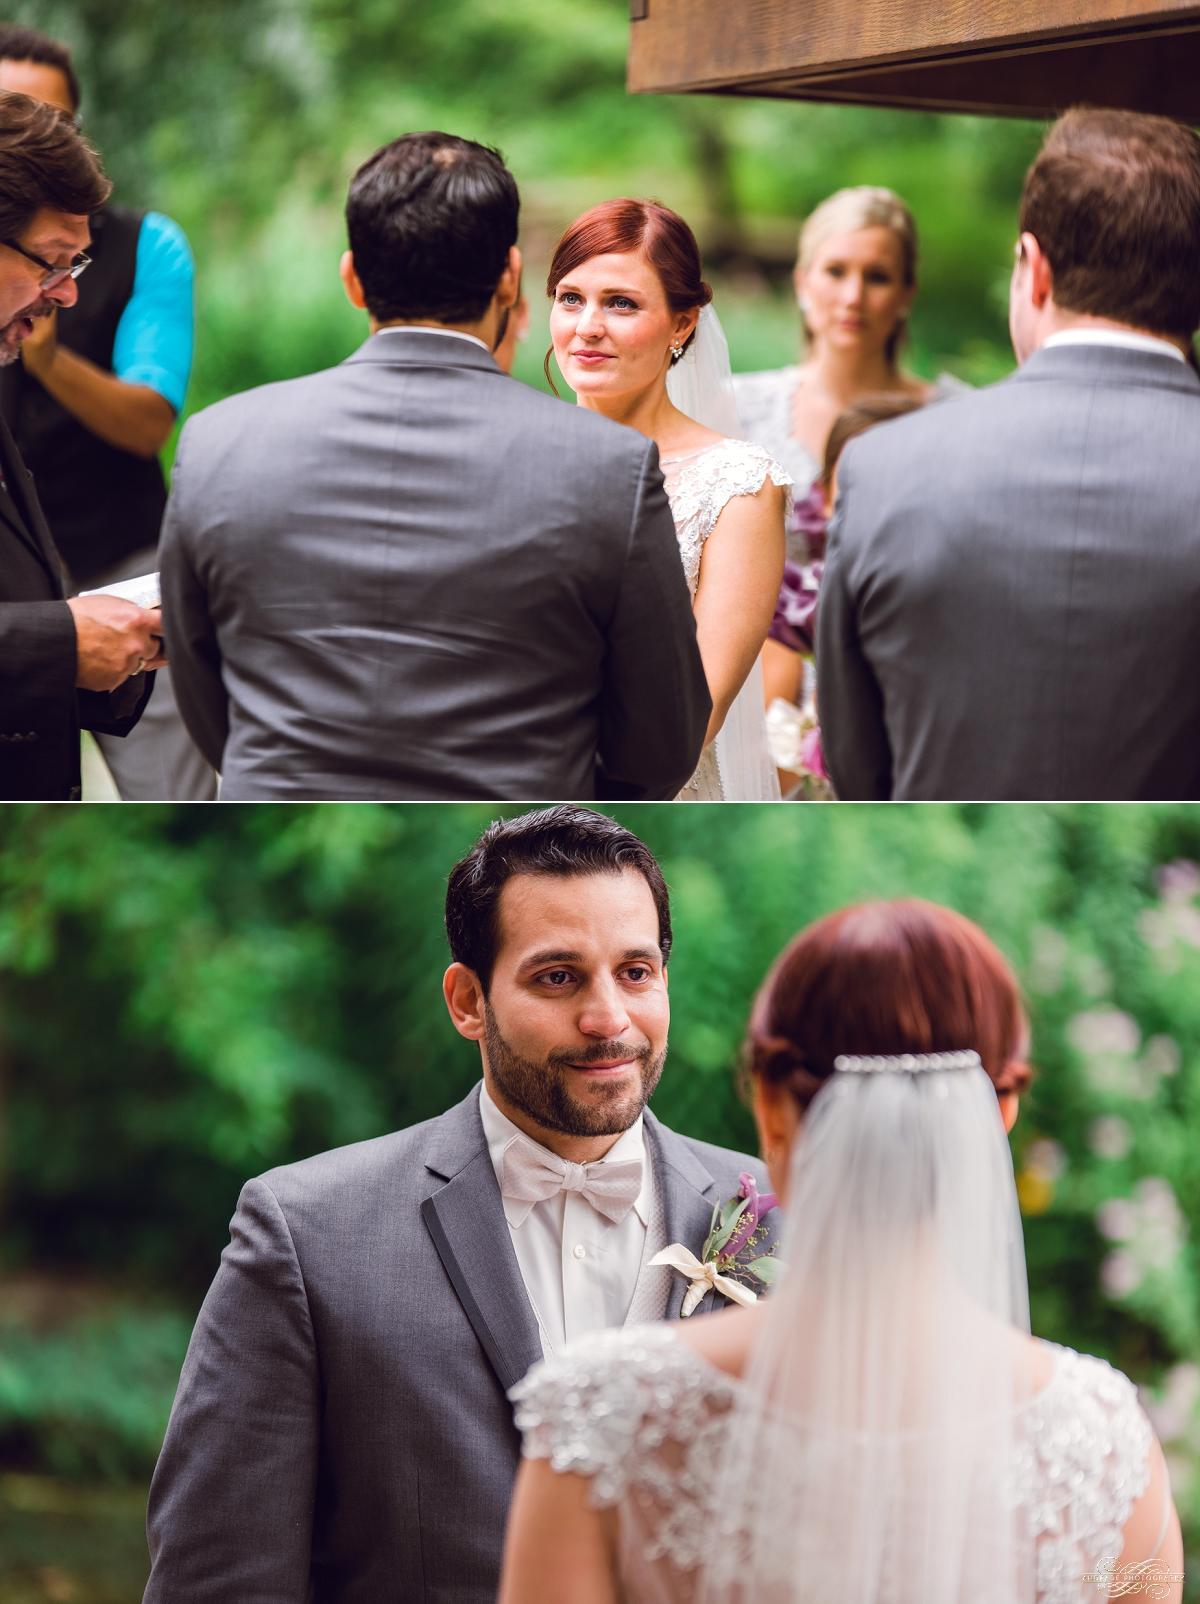 Jillian & Felix Chicago Wedding Photography at Oak & Char Trump Tower and Chicago Athletic Association_0016.jpg